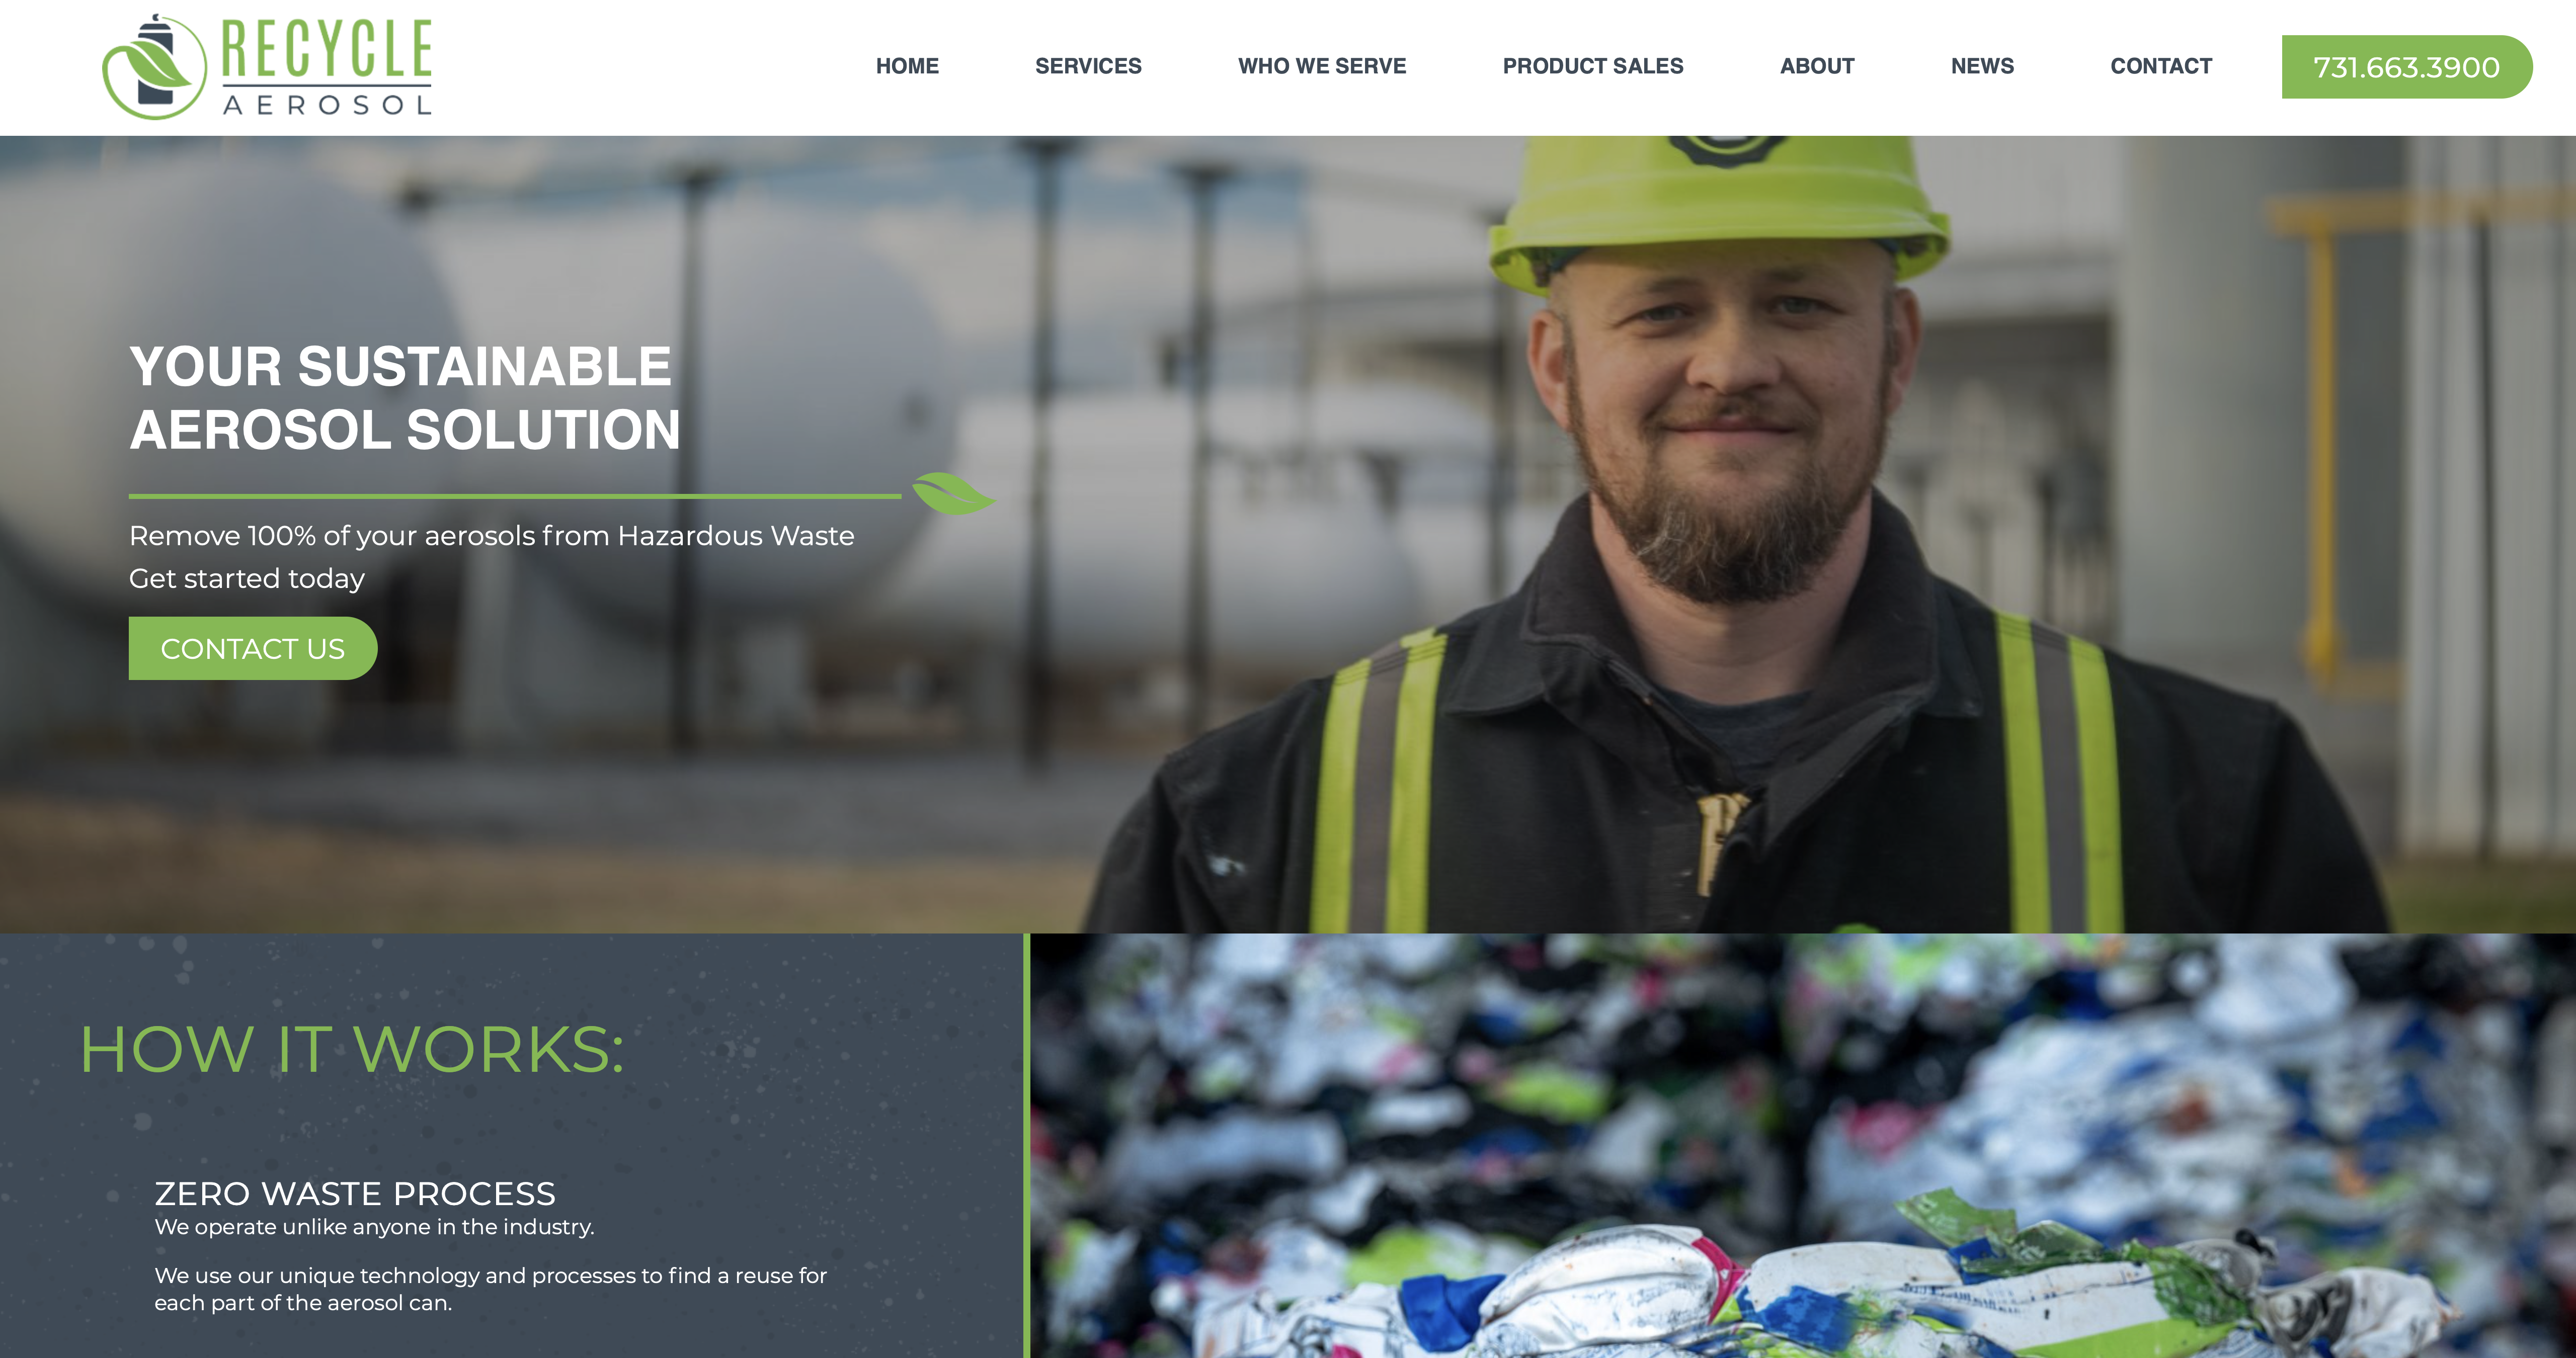 Image: Recycle Aerosol